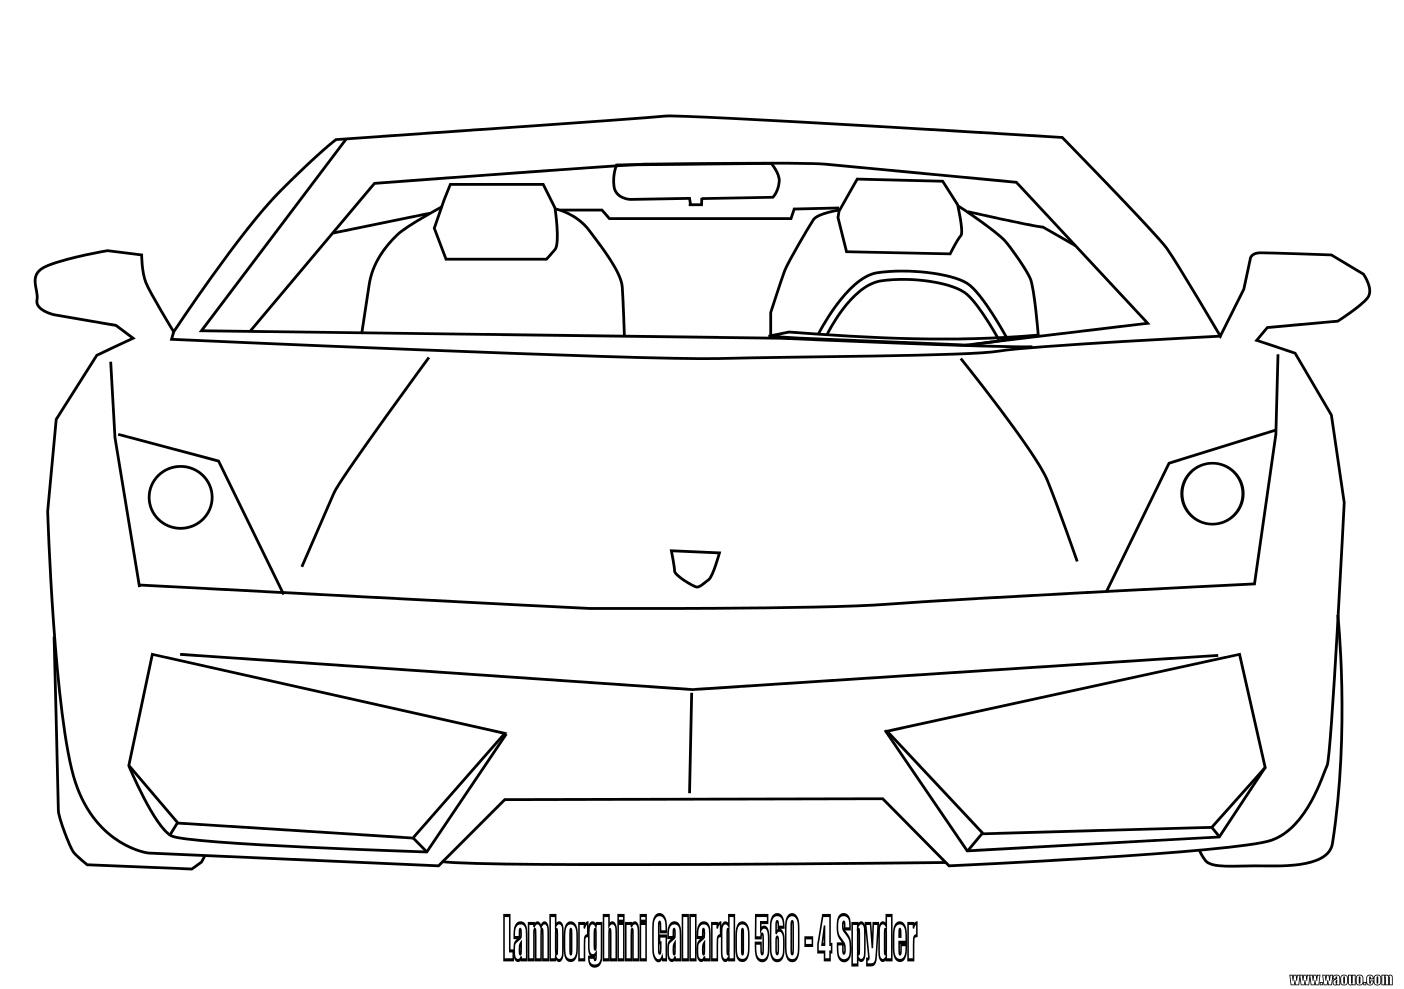 Lamborghini Gallardo : Coloriage Lamborghini Gallardo À destiné Ferrari A Colorier